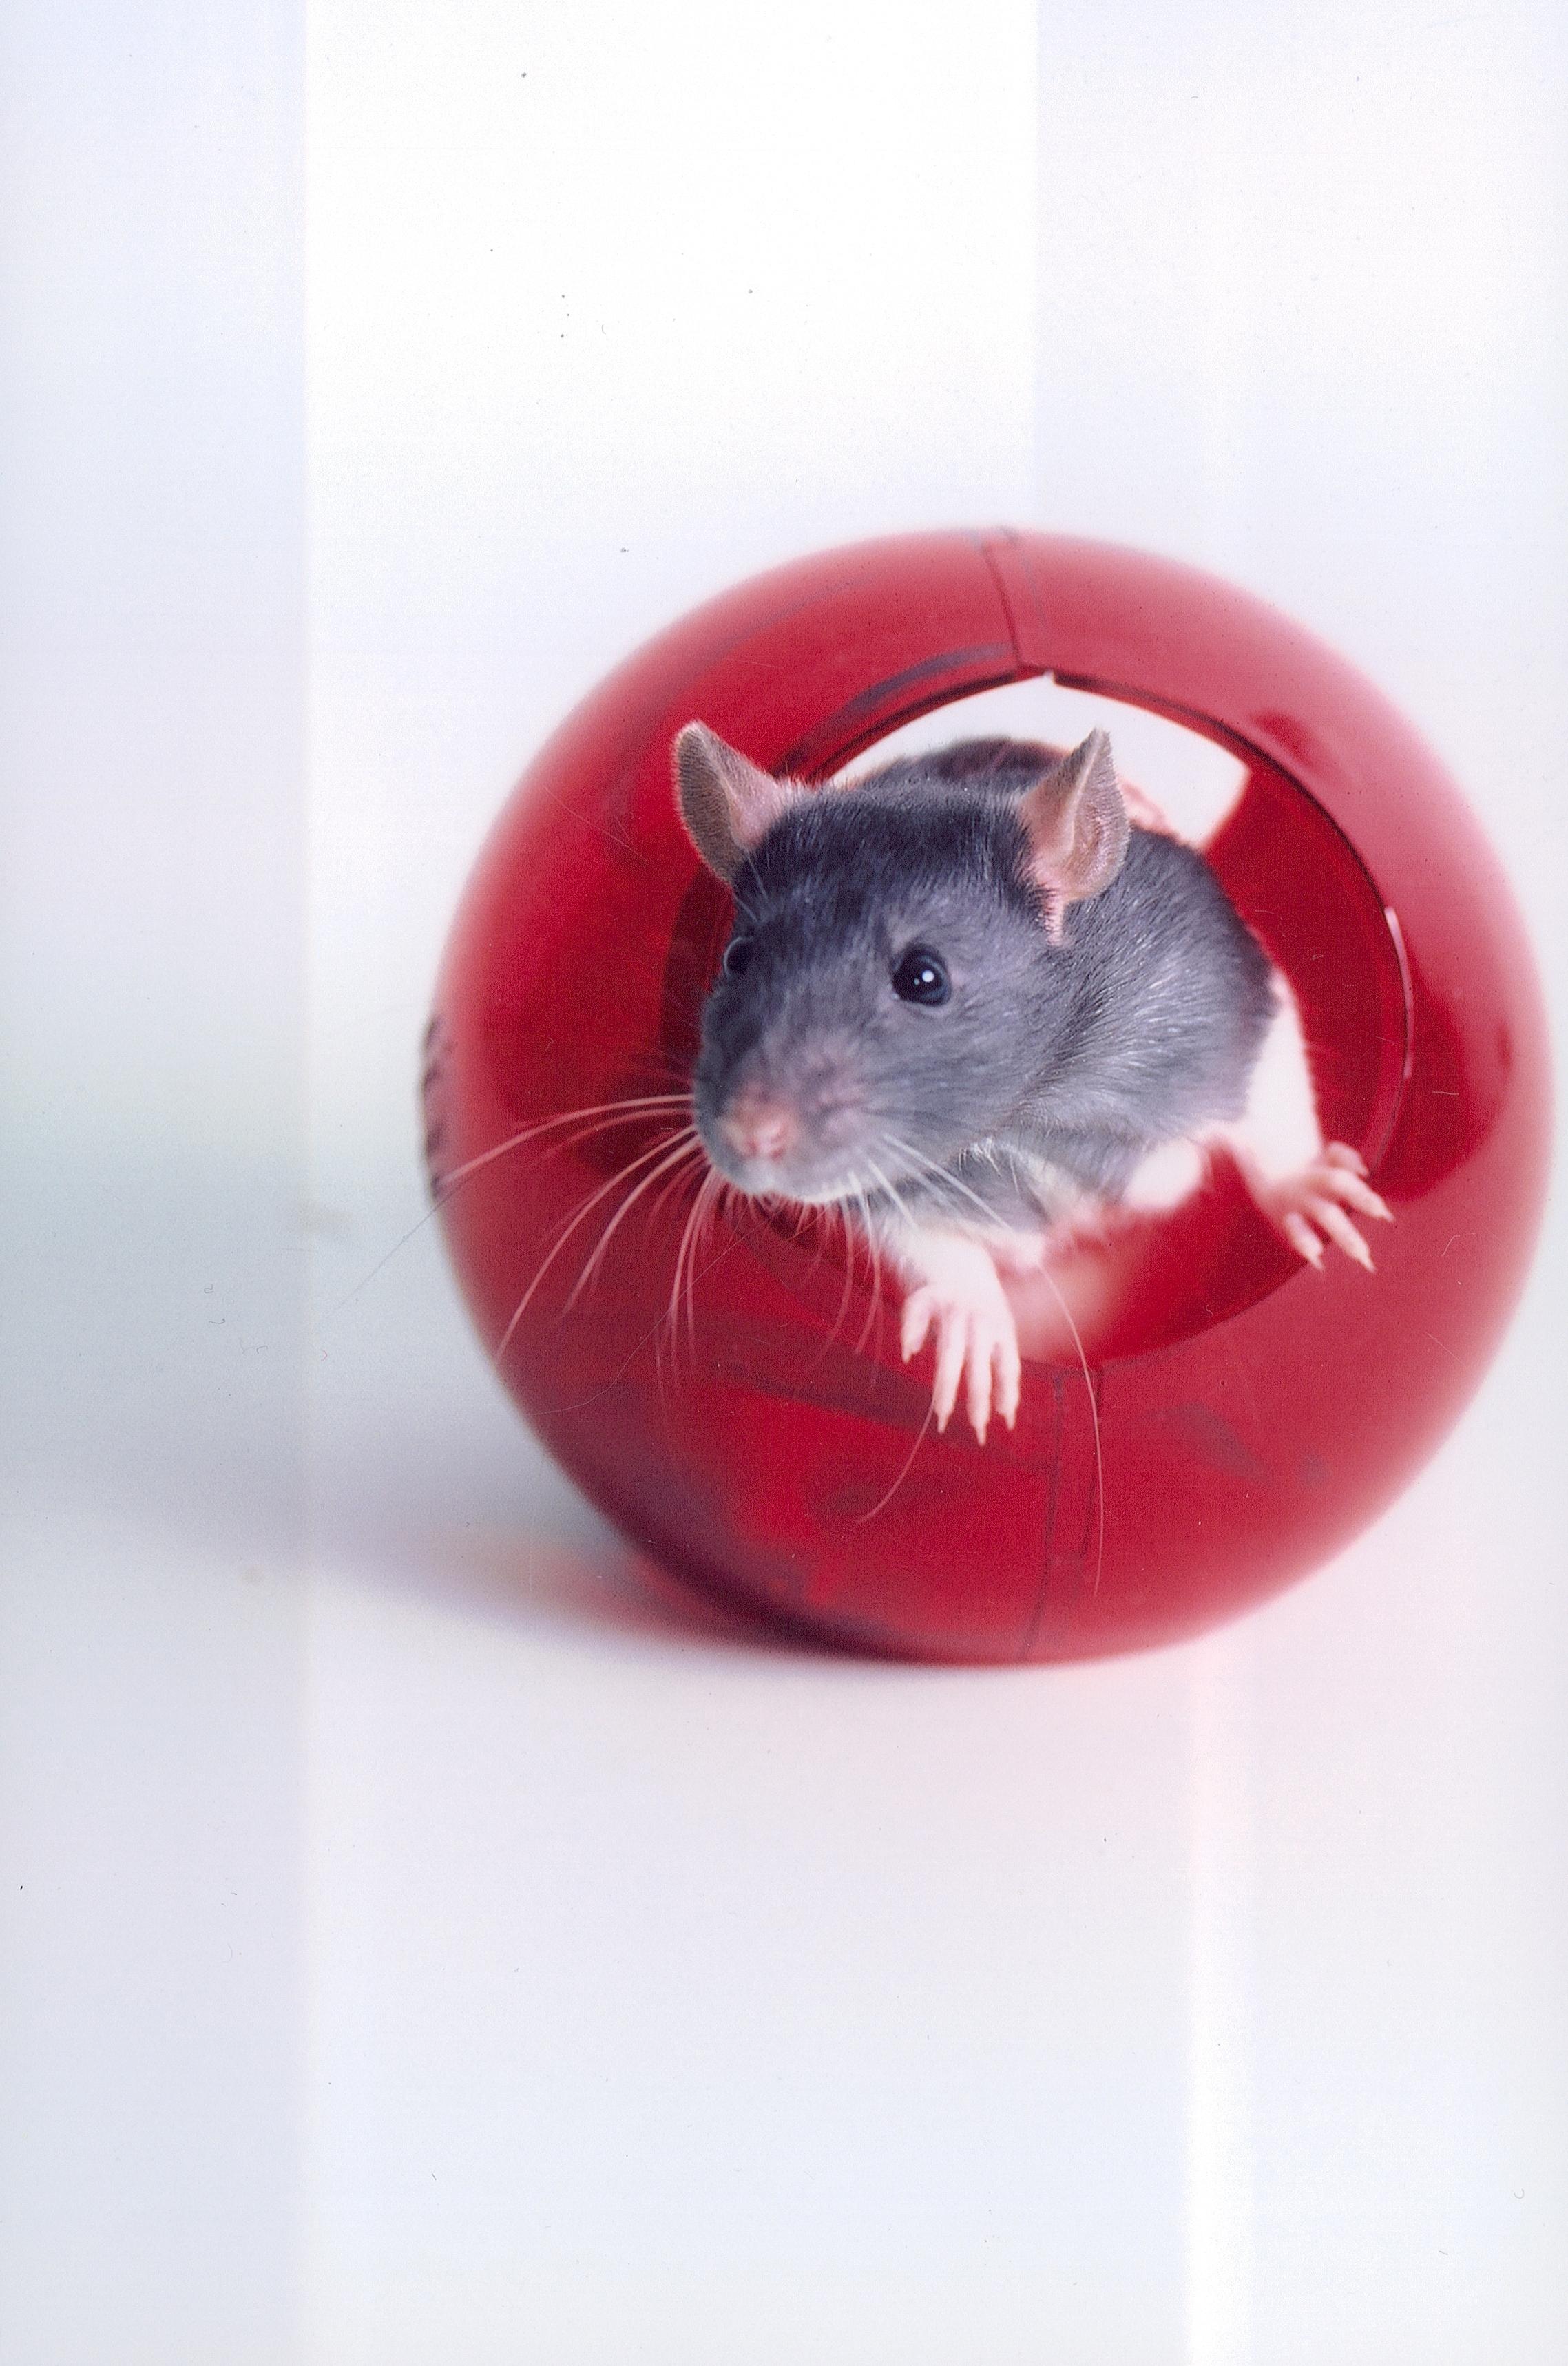 CRISPR gene editing eliminates HIV infection in mice ...